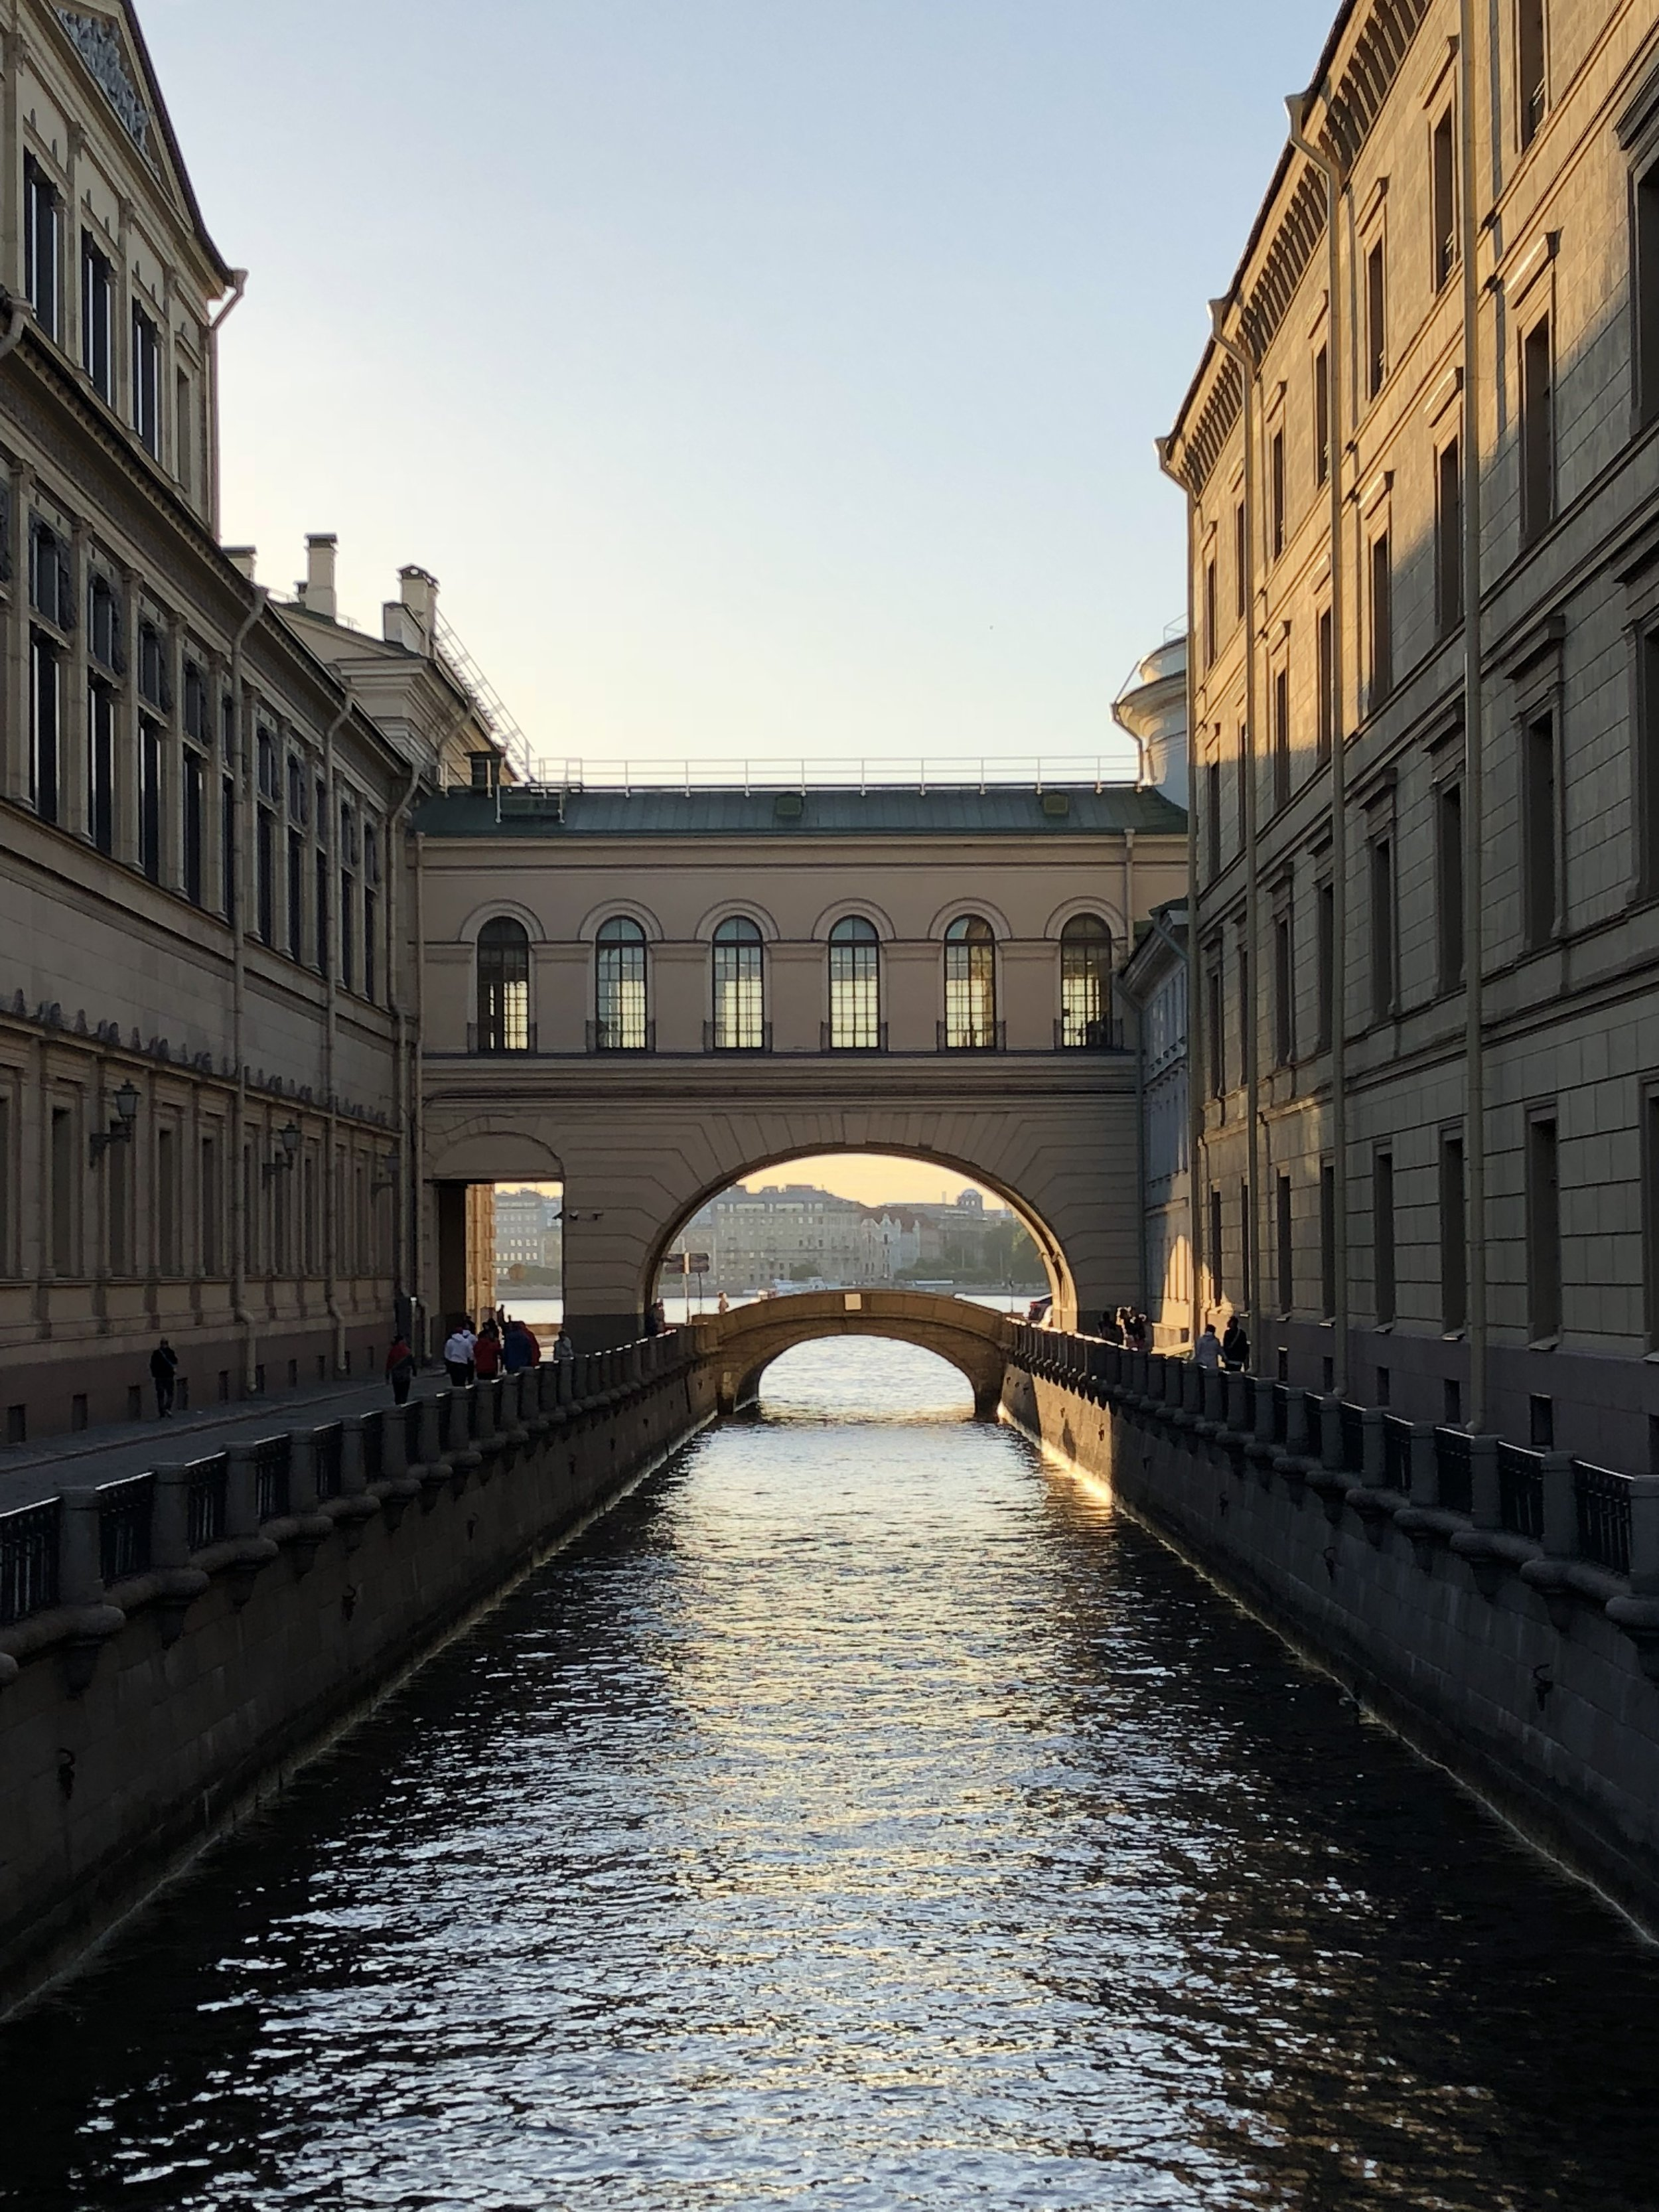 Canals at dusk.jpg